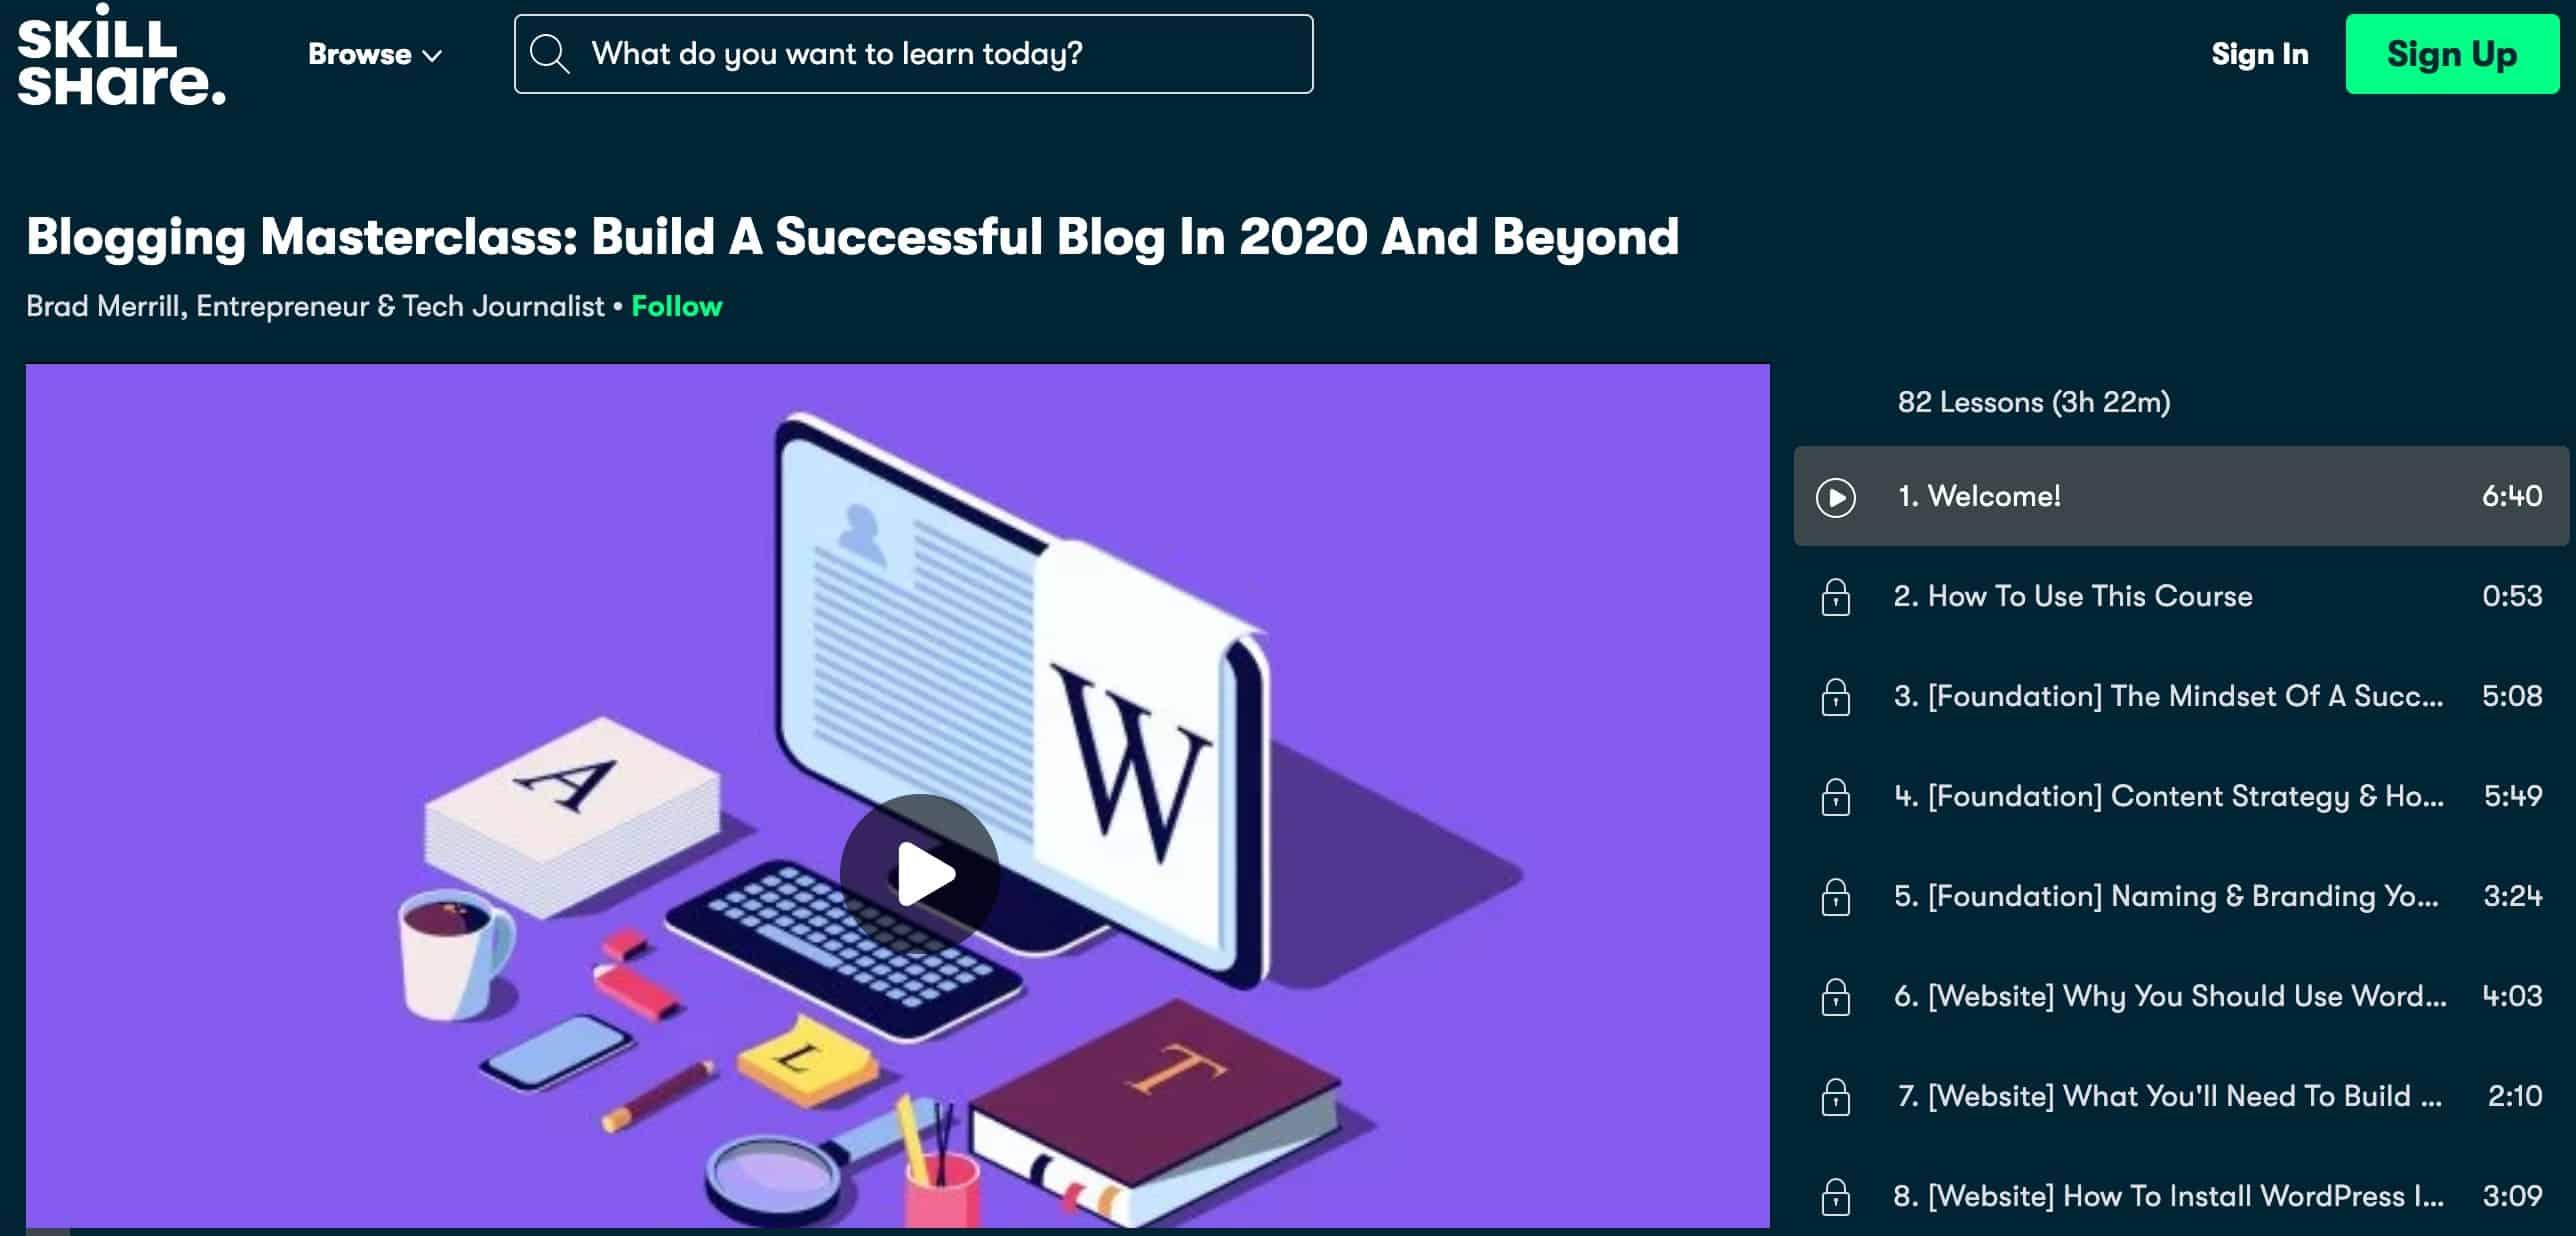 Blogging Masterclass